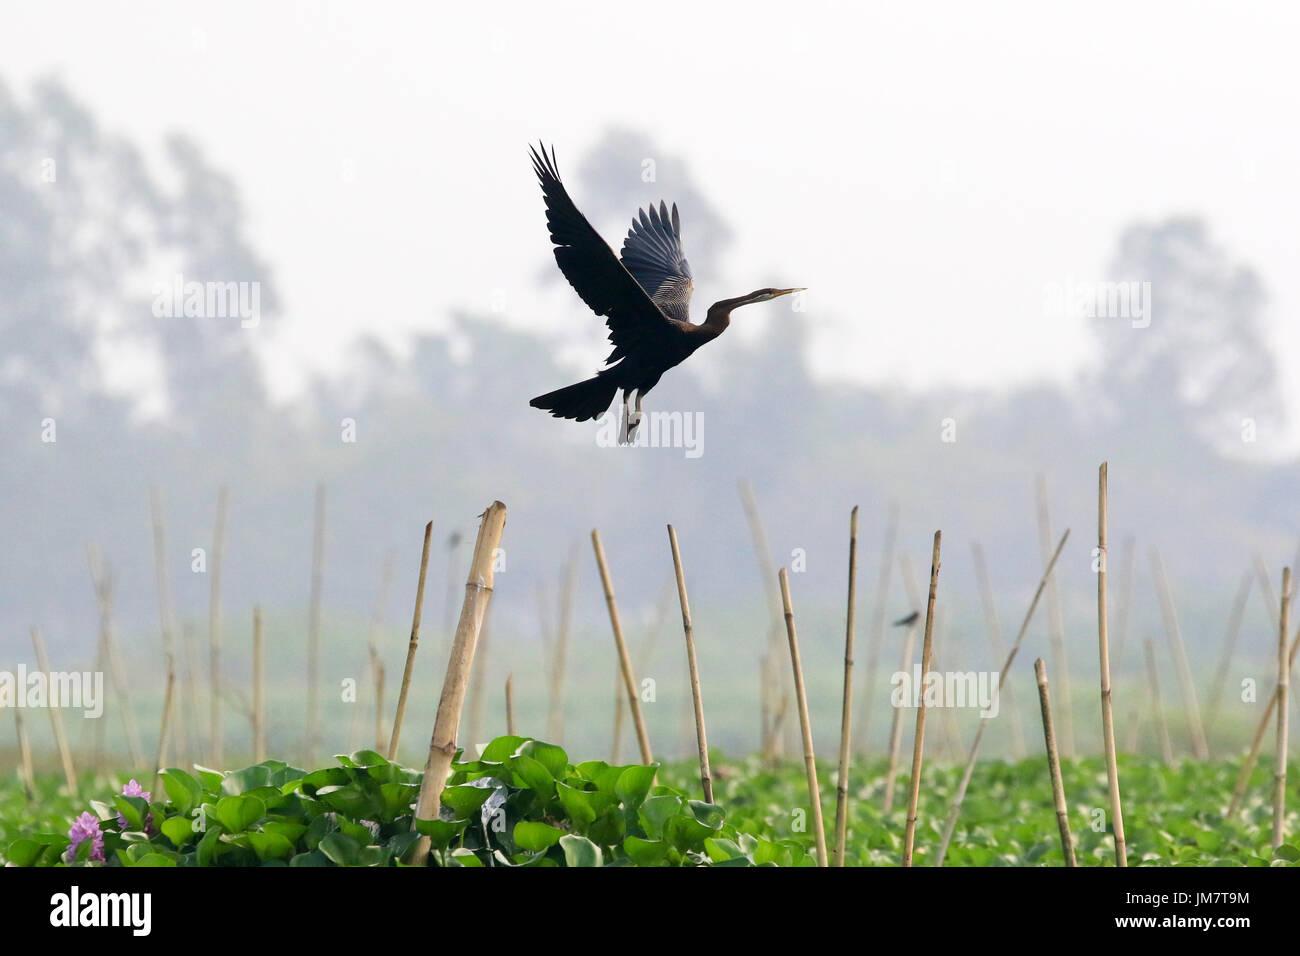 Oriental Darter also known as Shap-pakhi, at Baikka Beel in Moulvibazar district in Bangladesh. - Stock Image